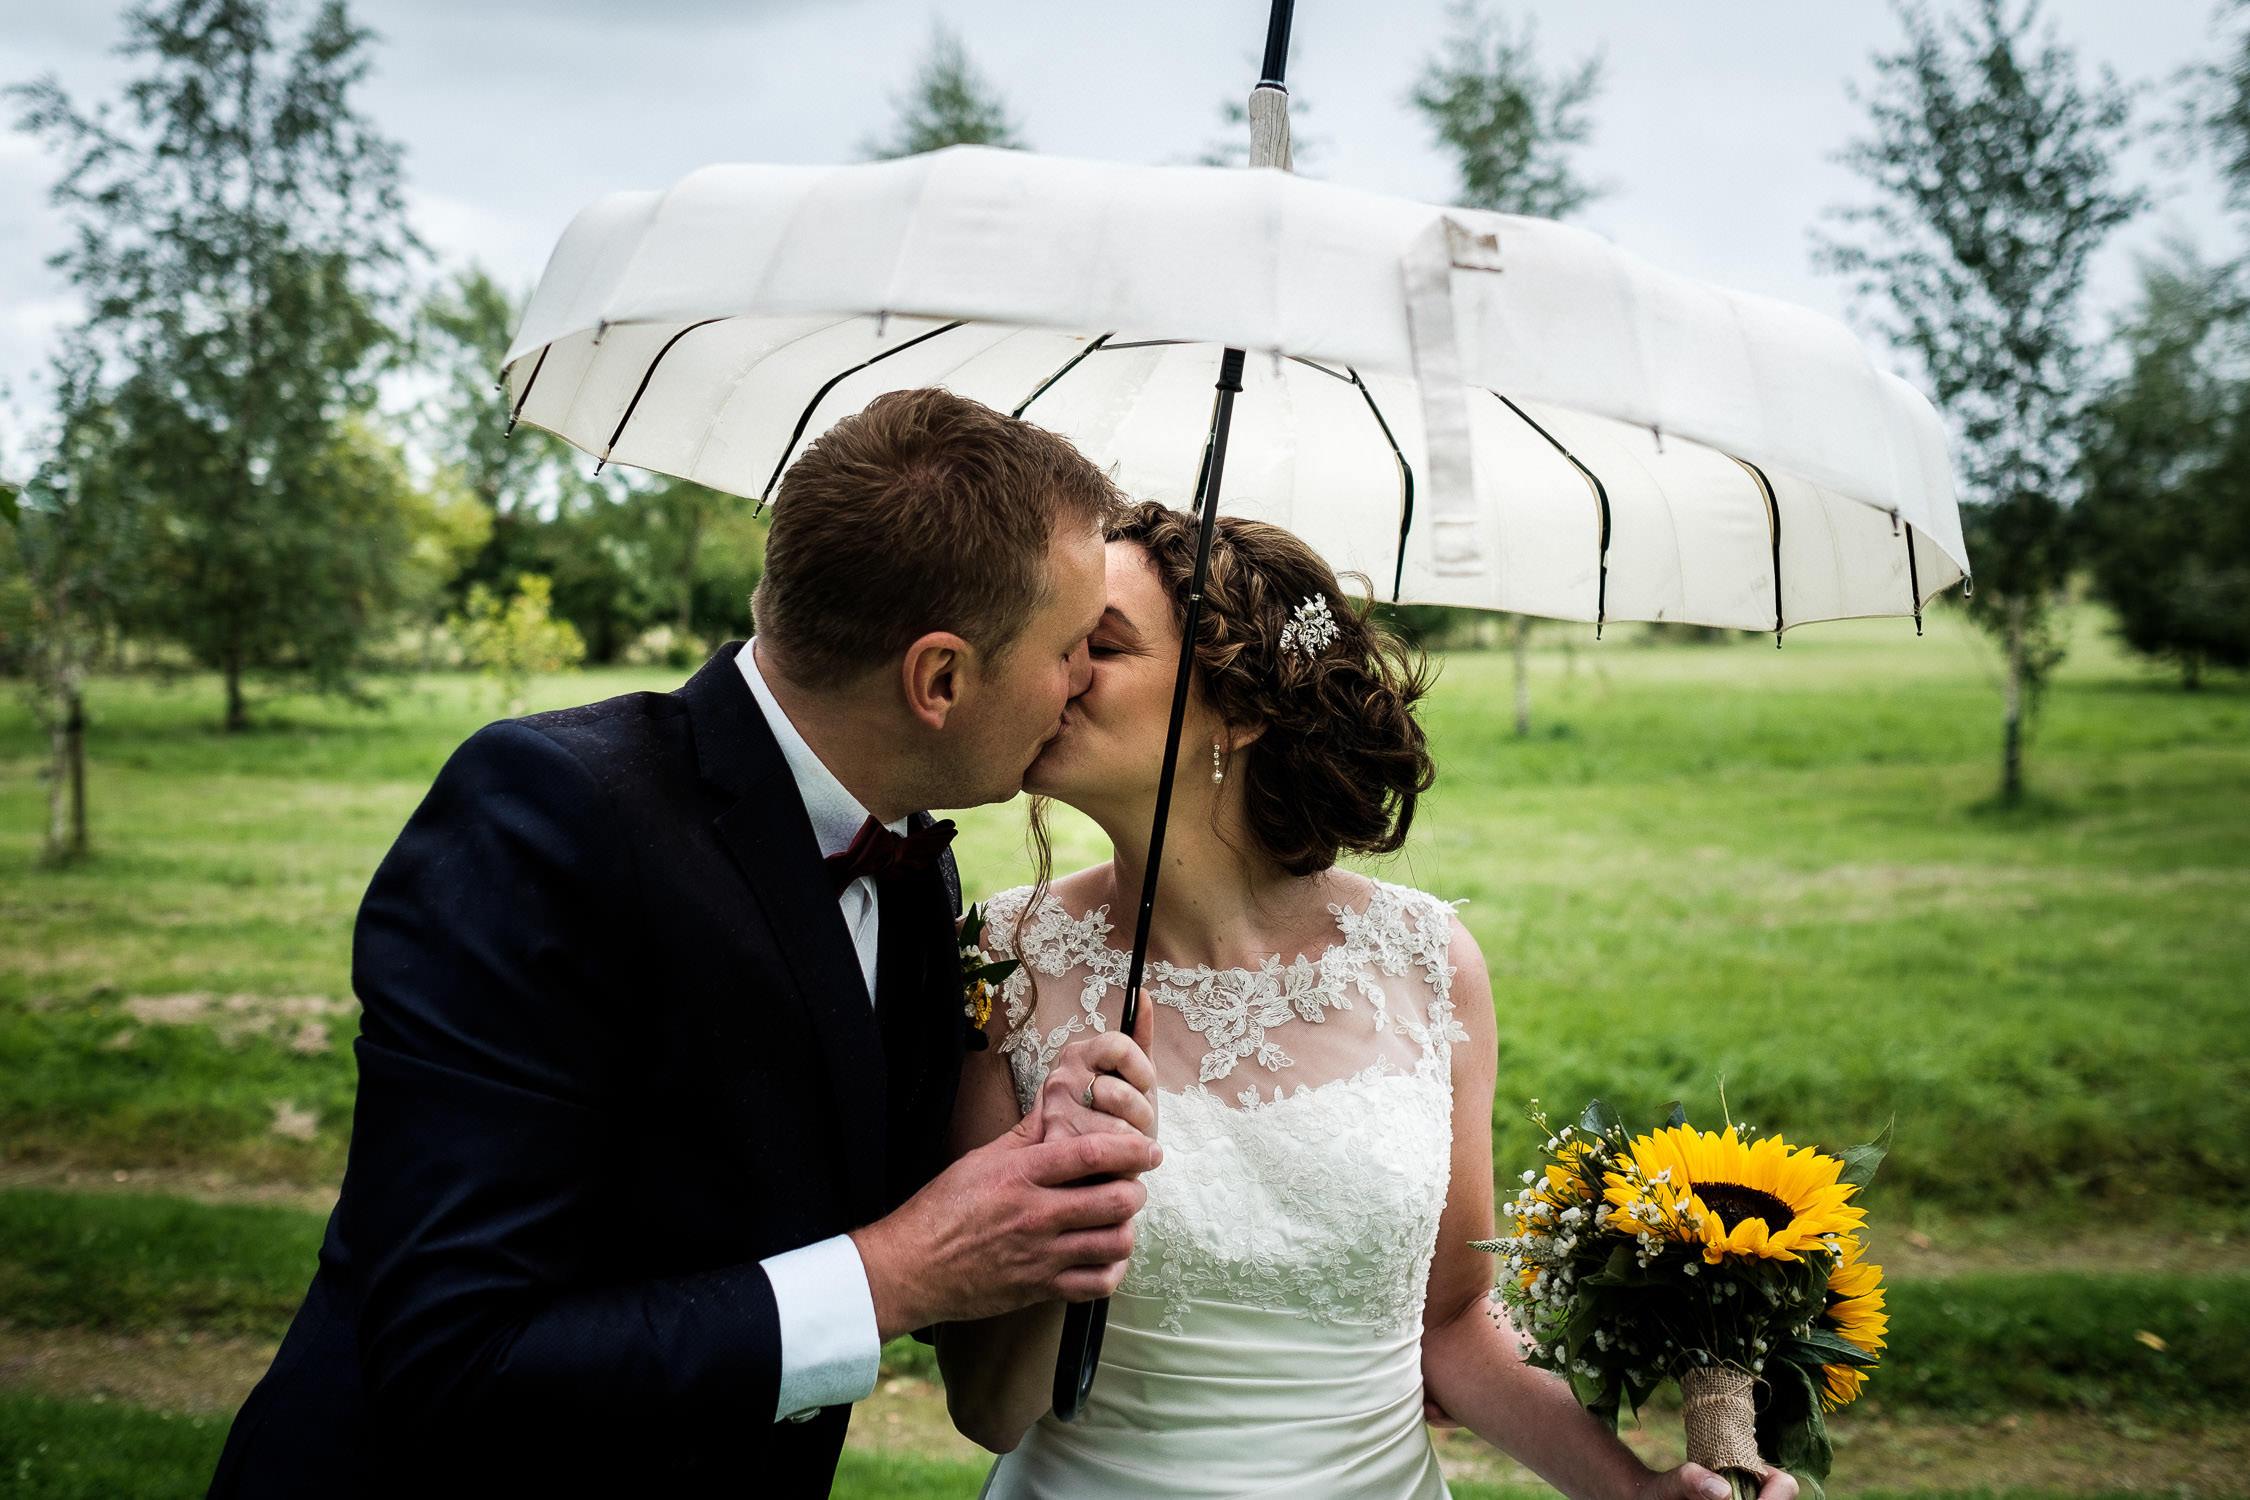 wedding couple share kiss under umbrella